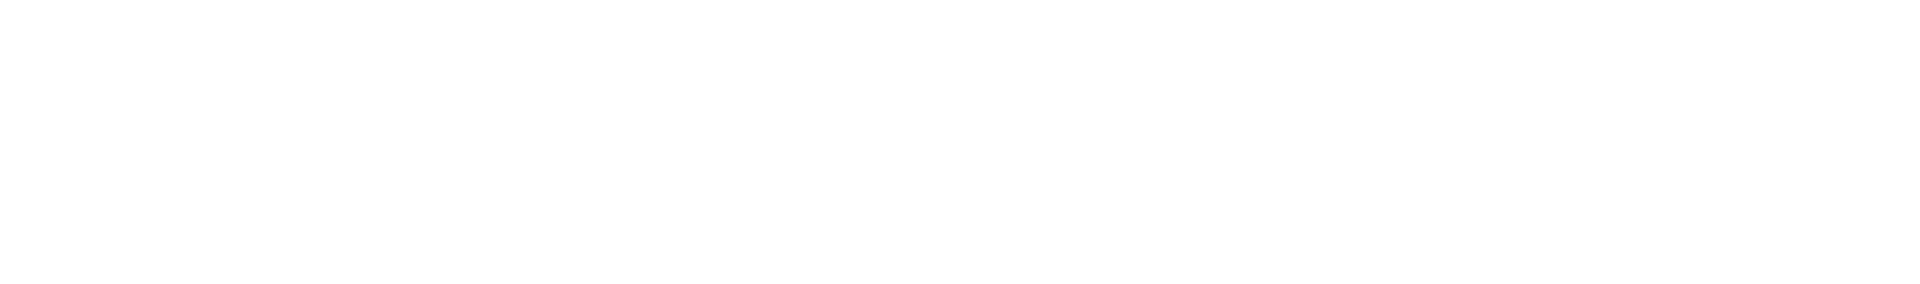 MRAEL IntoWork lockup logo white